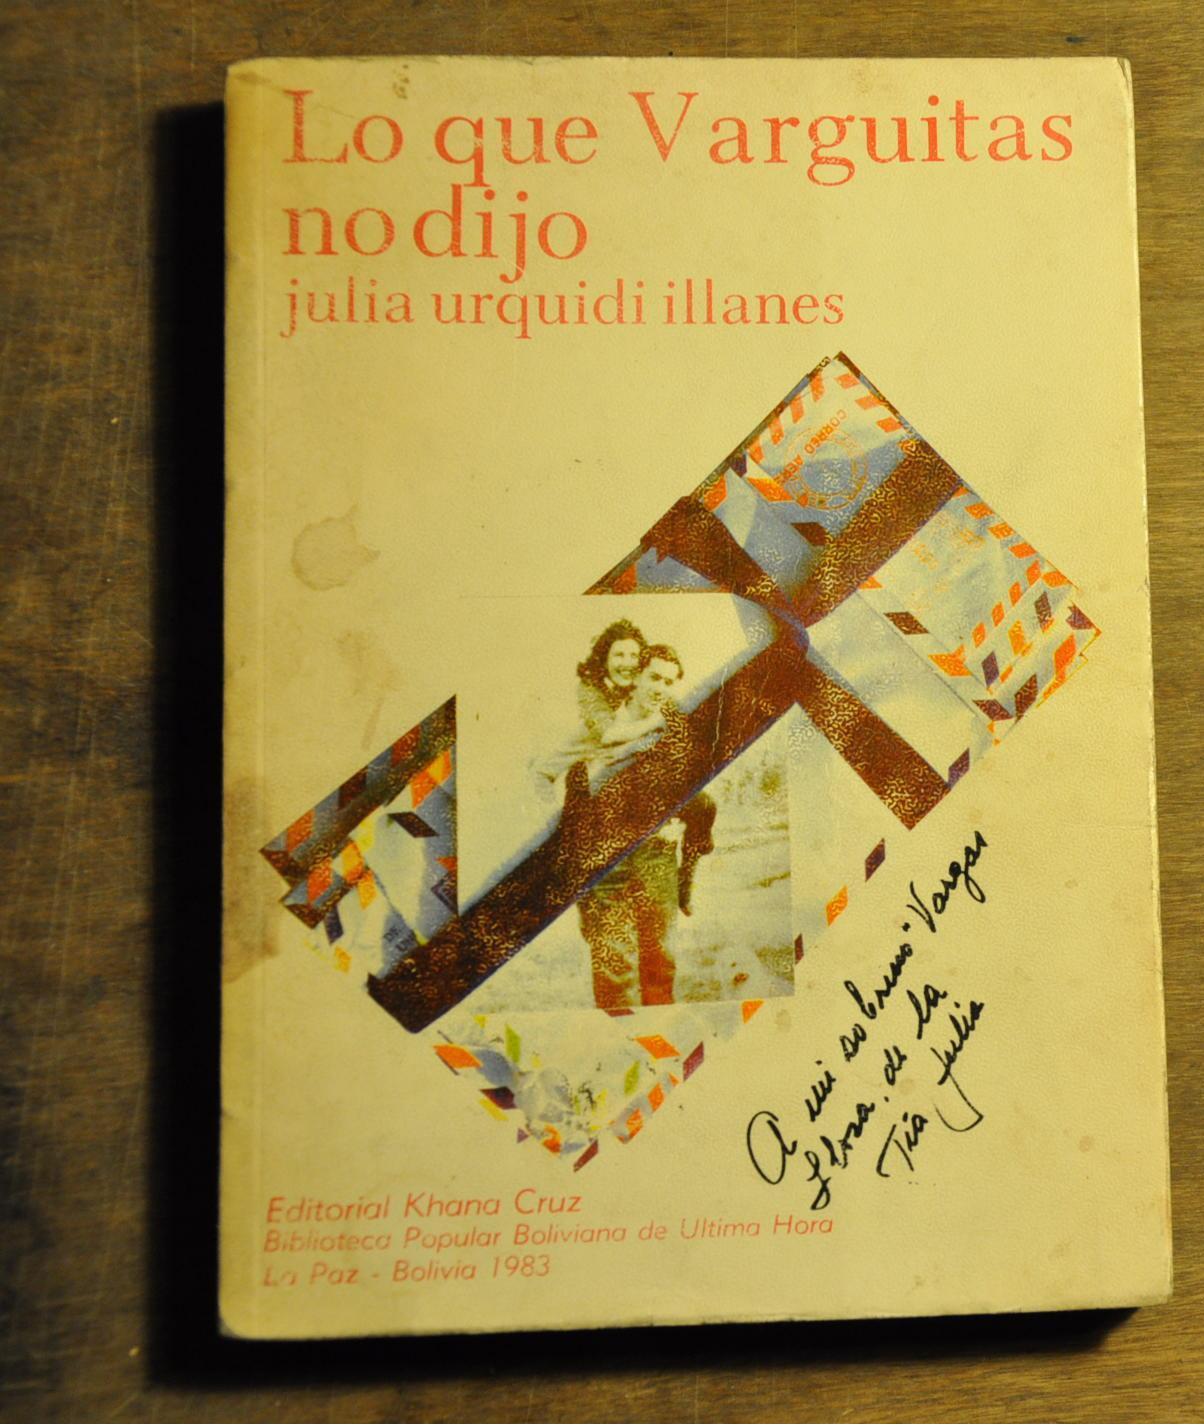 Libros bolivianos